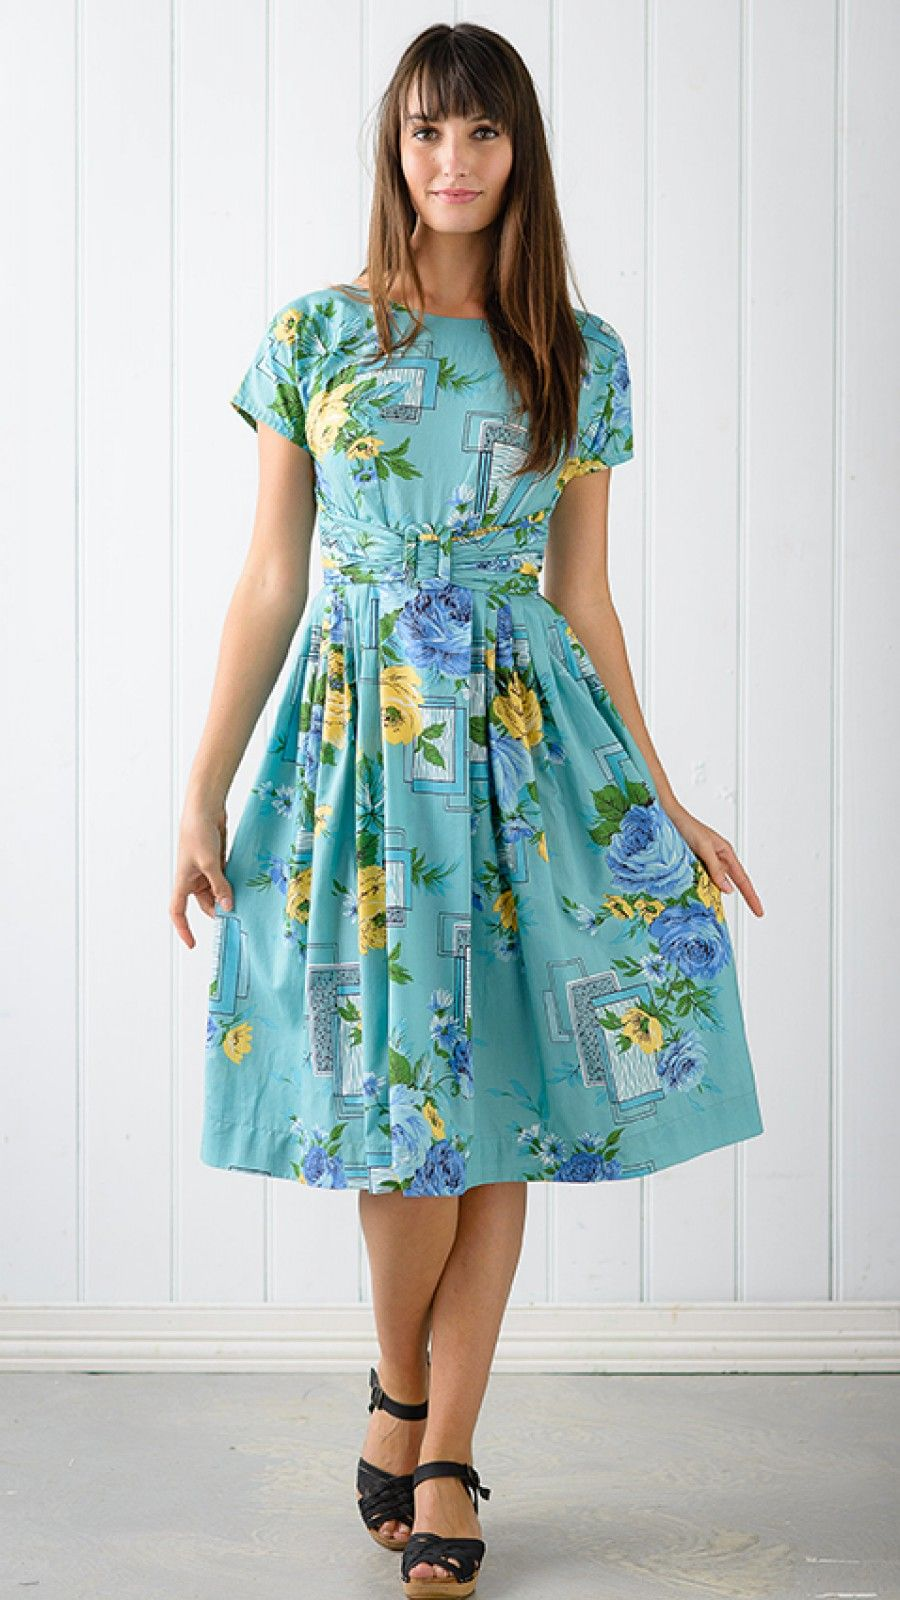 Olivia short sleeve dress in adeline the third row frocks